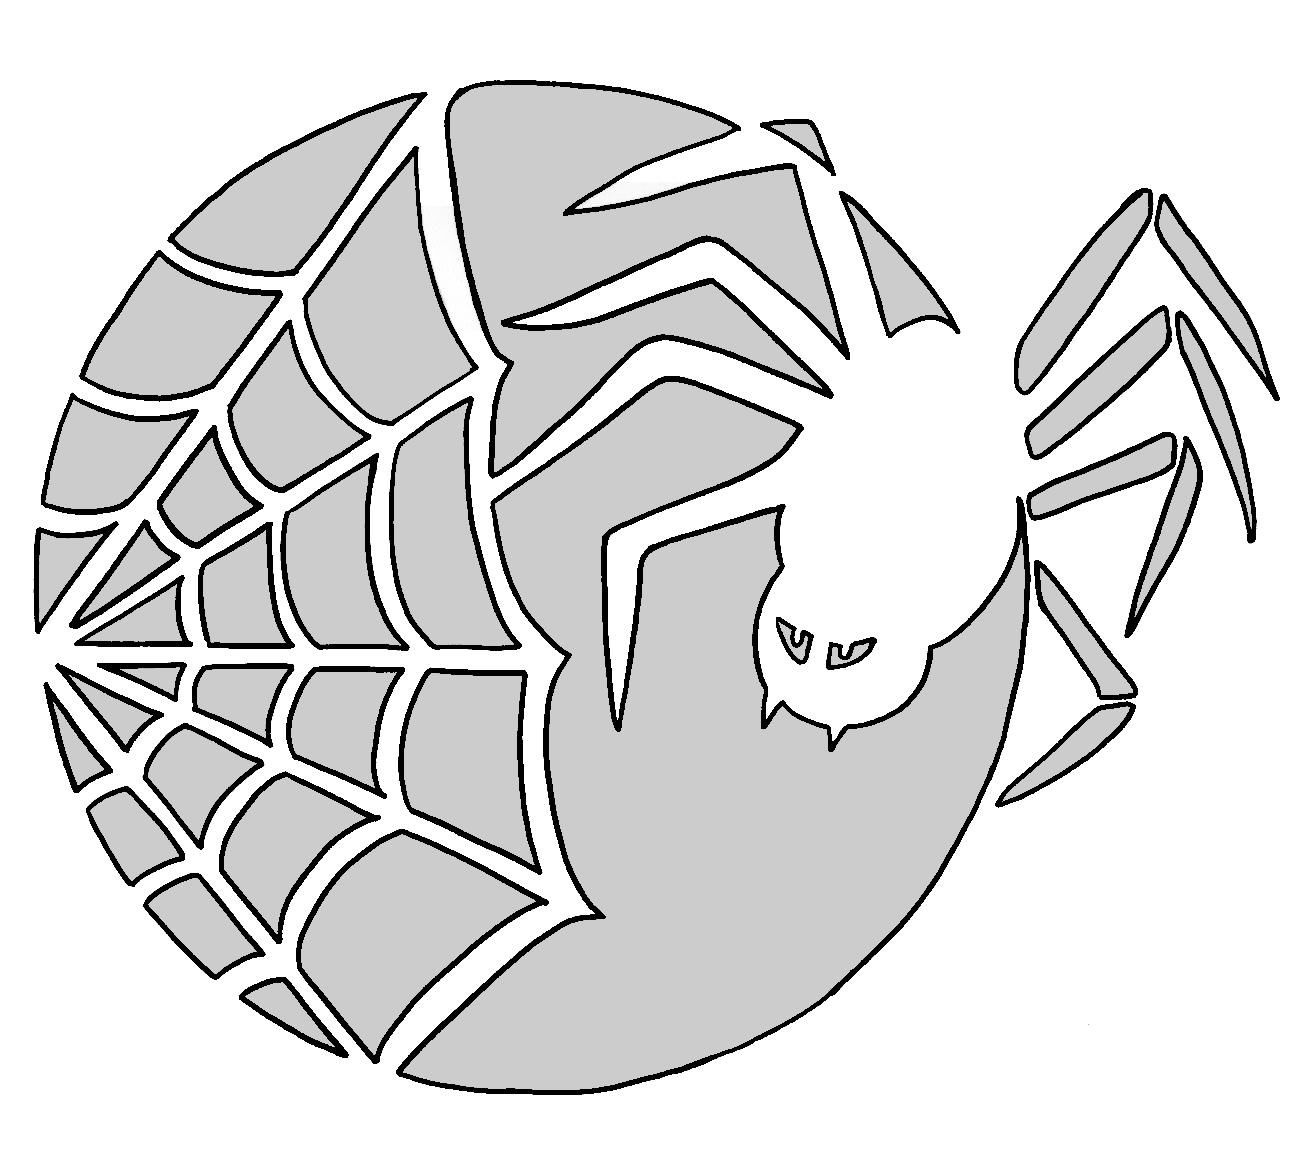 Spider Web Pattern | Spider Man Party In 2019 | Pumpkin Carving - Spider Web Stencil Free Printable